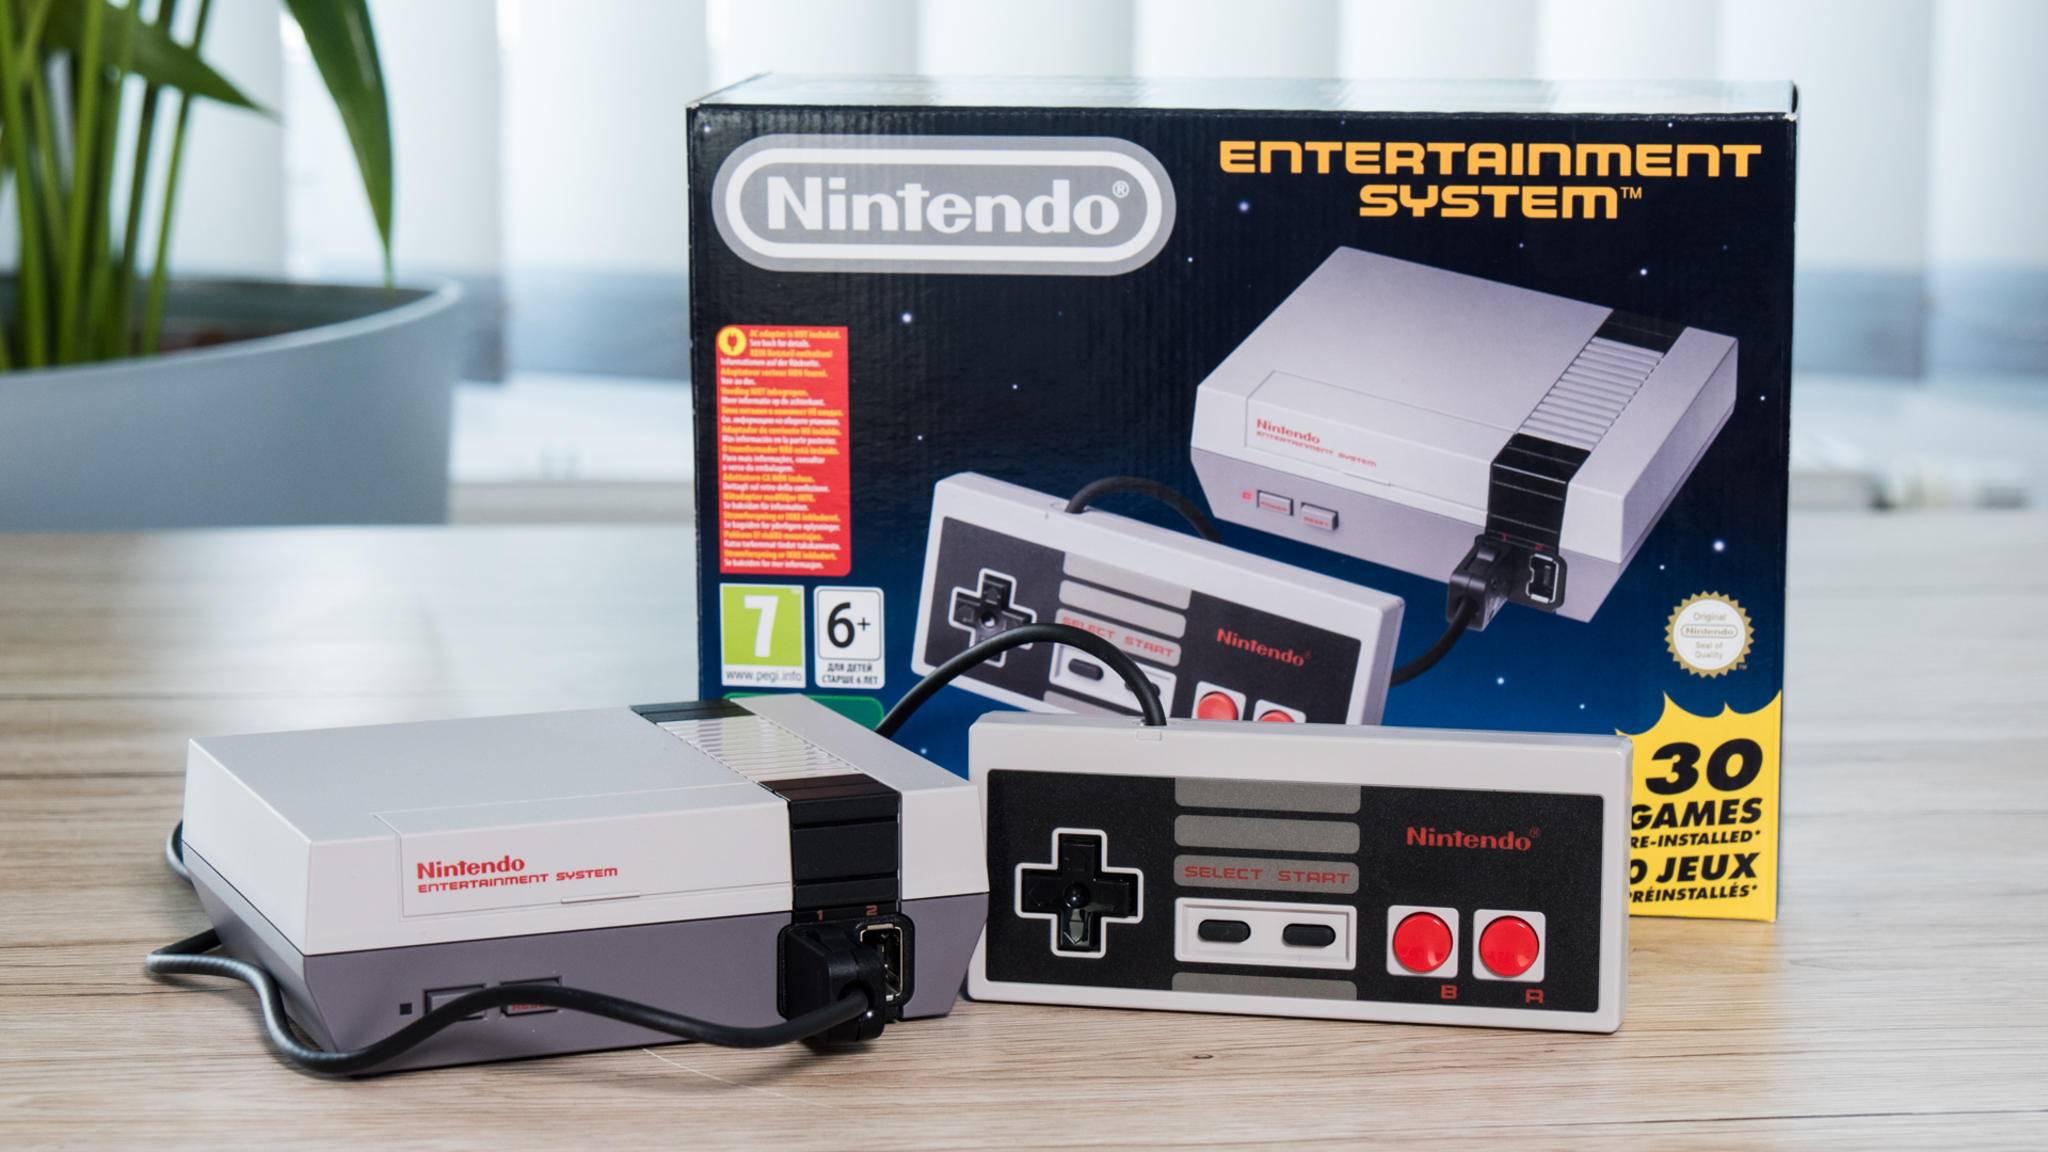 Nachschub: Das NES Classic Mini kommt wieder!